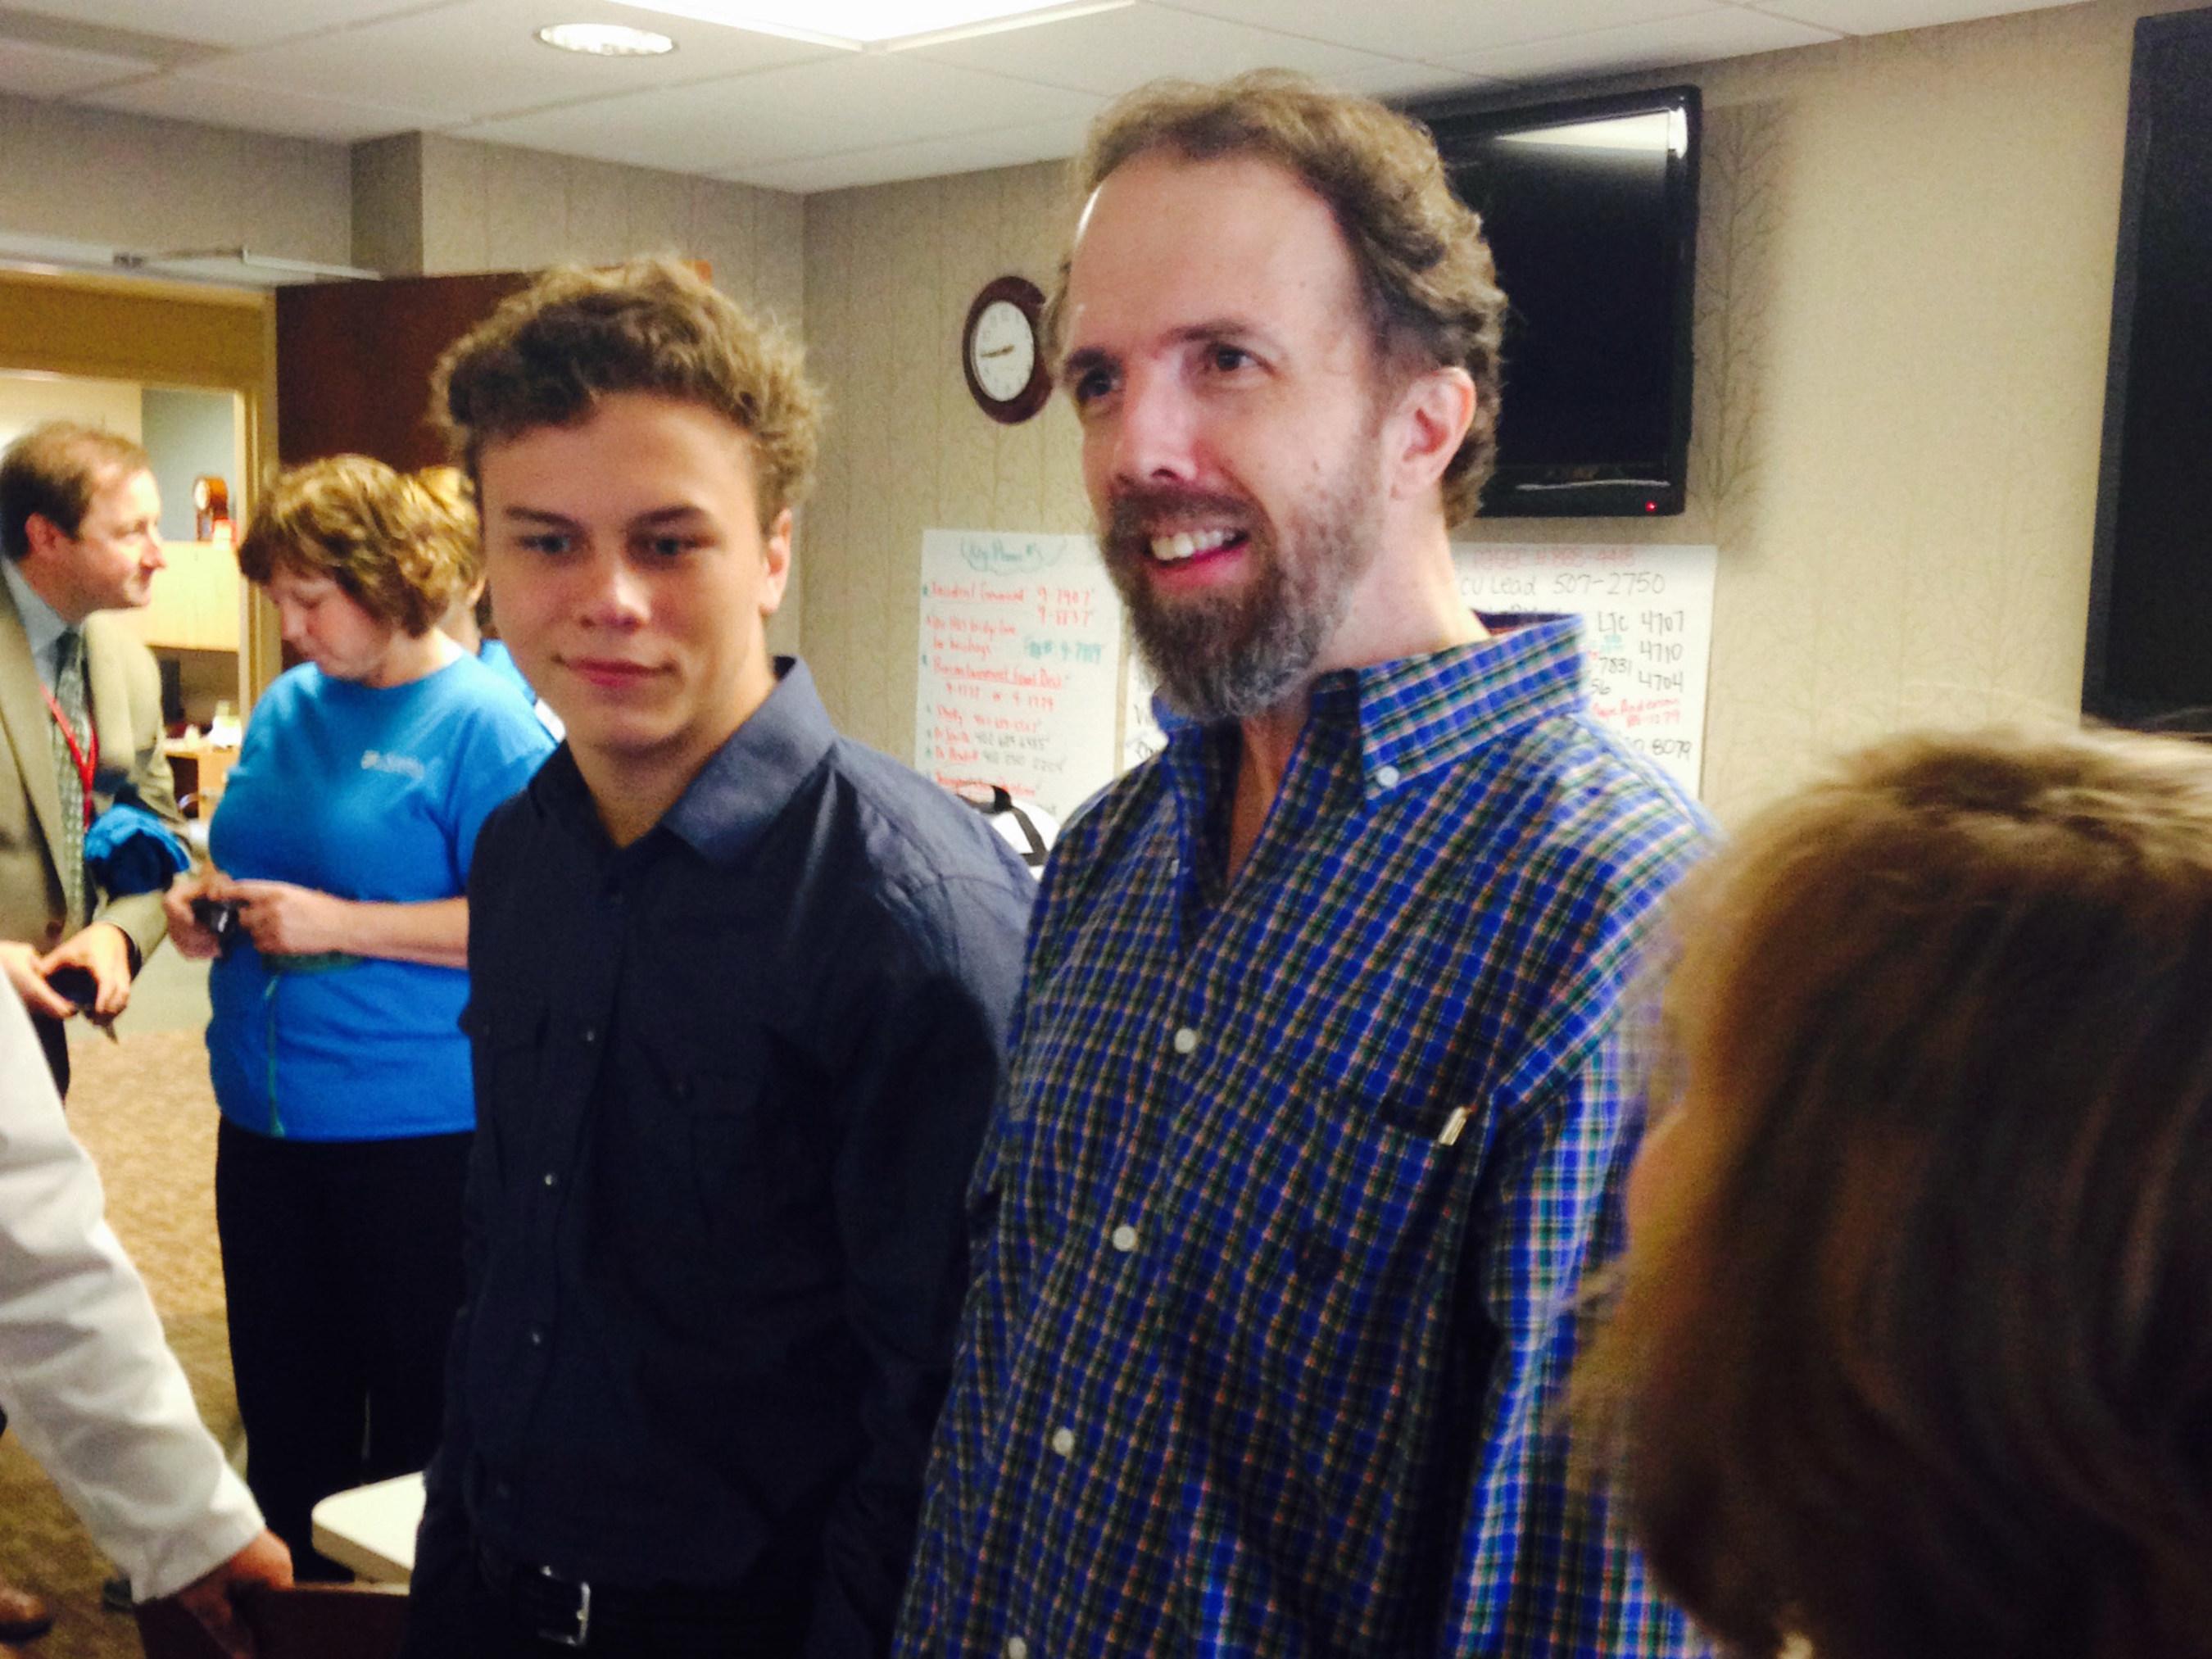 SIM Missionary Dr. Rick Sacra leaves the University of Nebraska Medical Center after successful treatment for ...